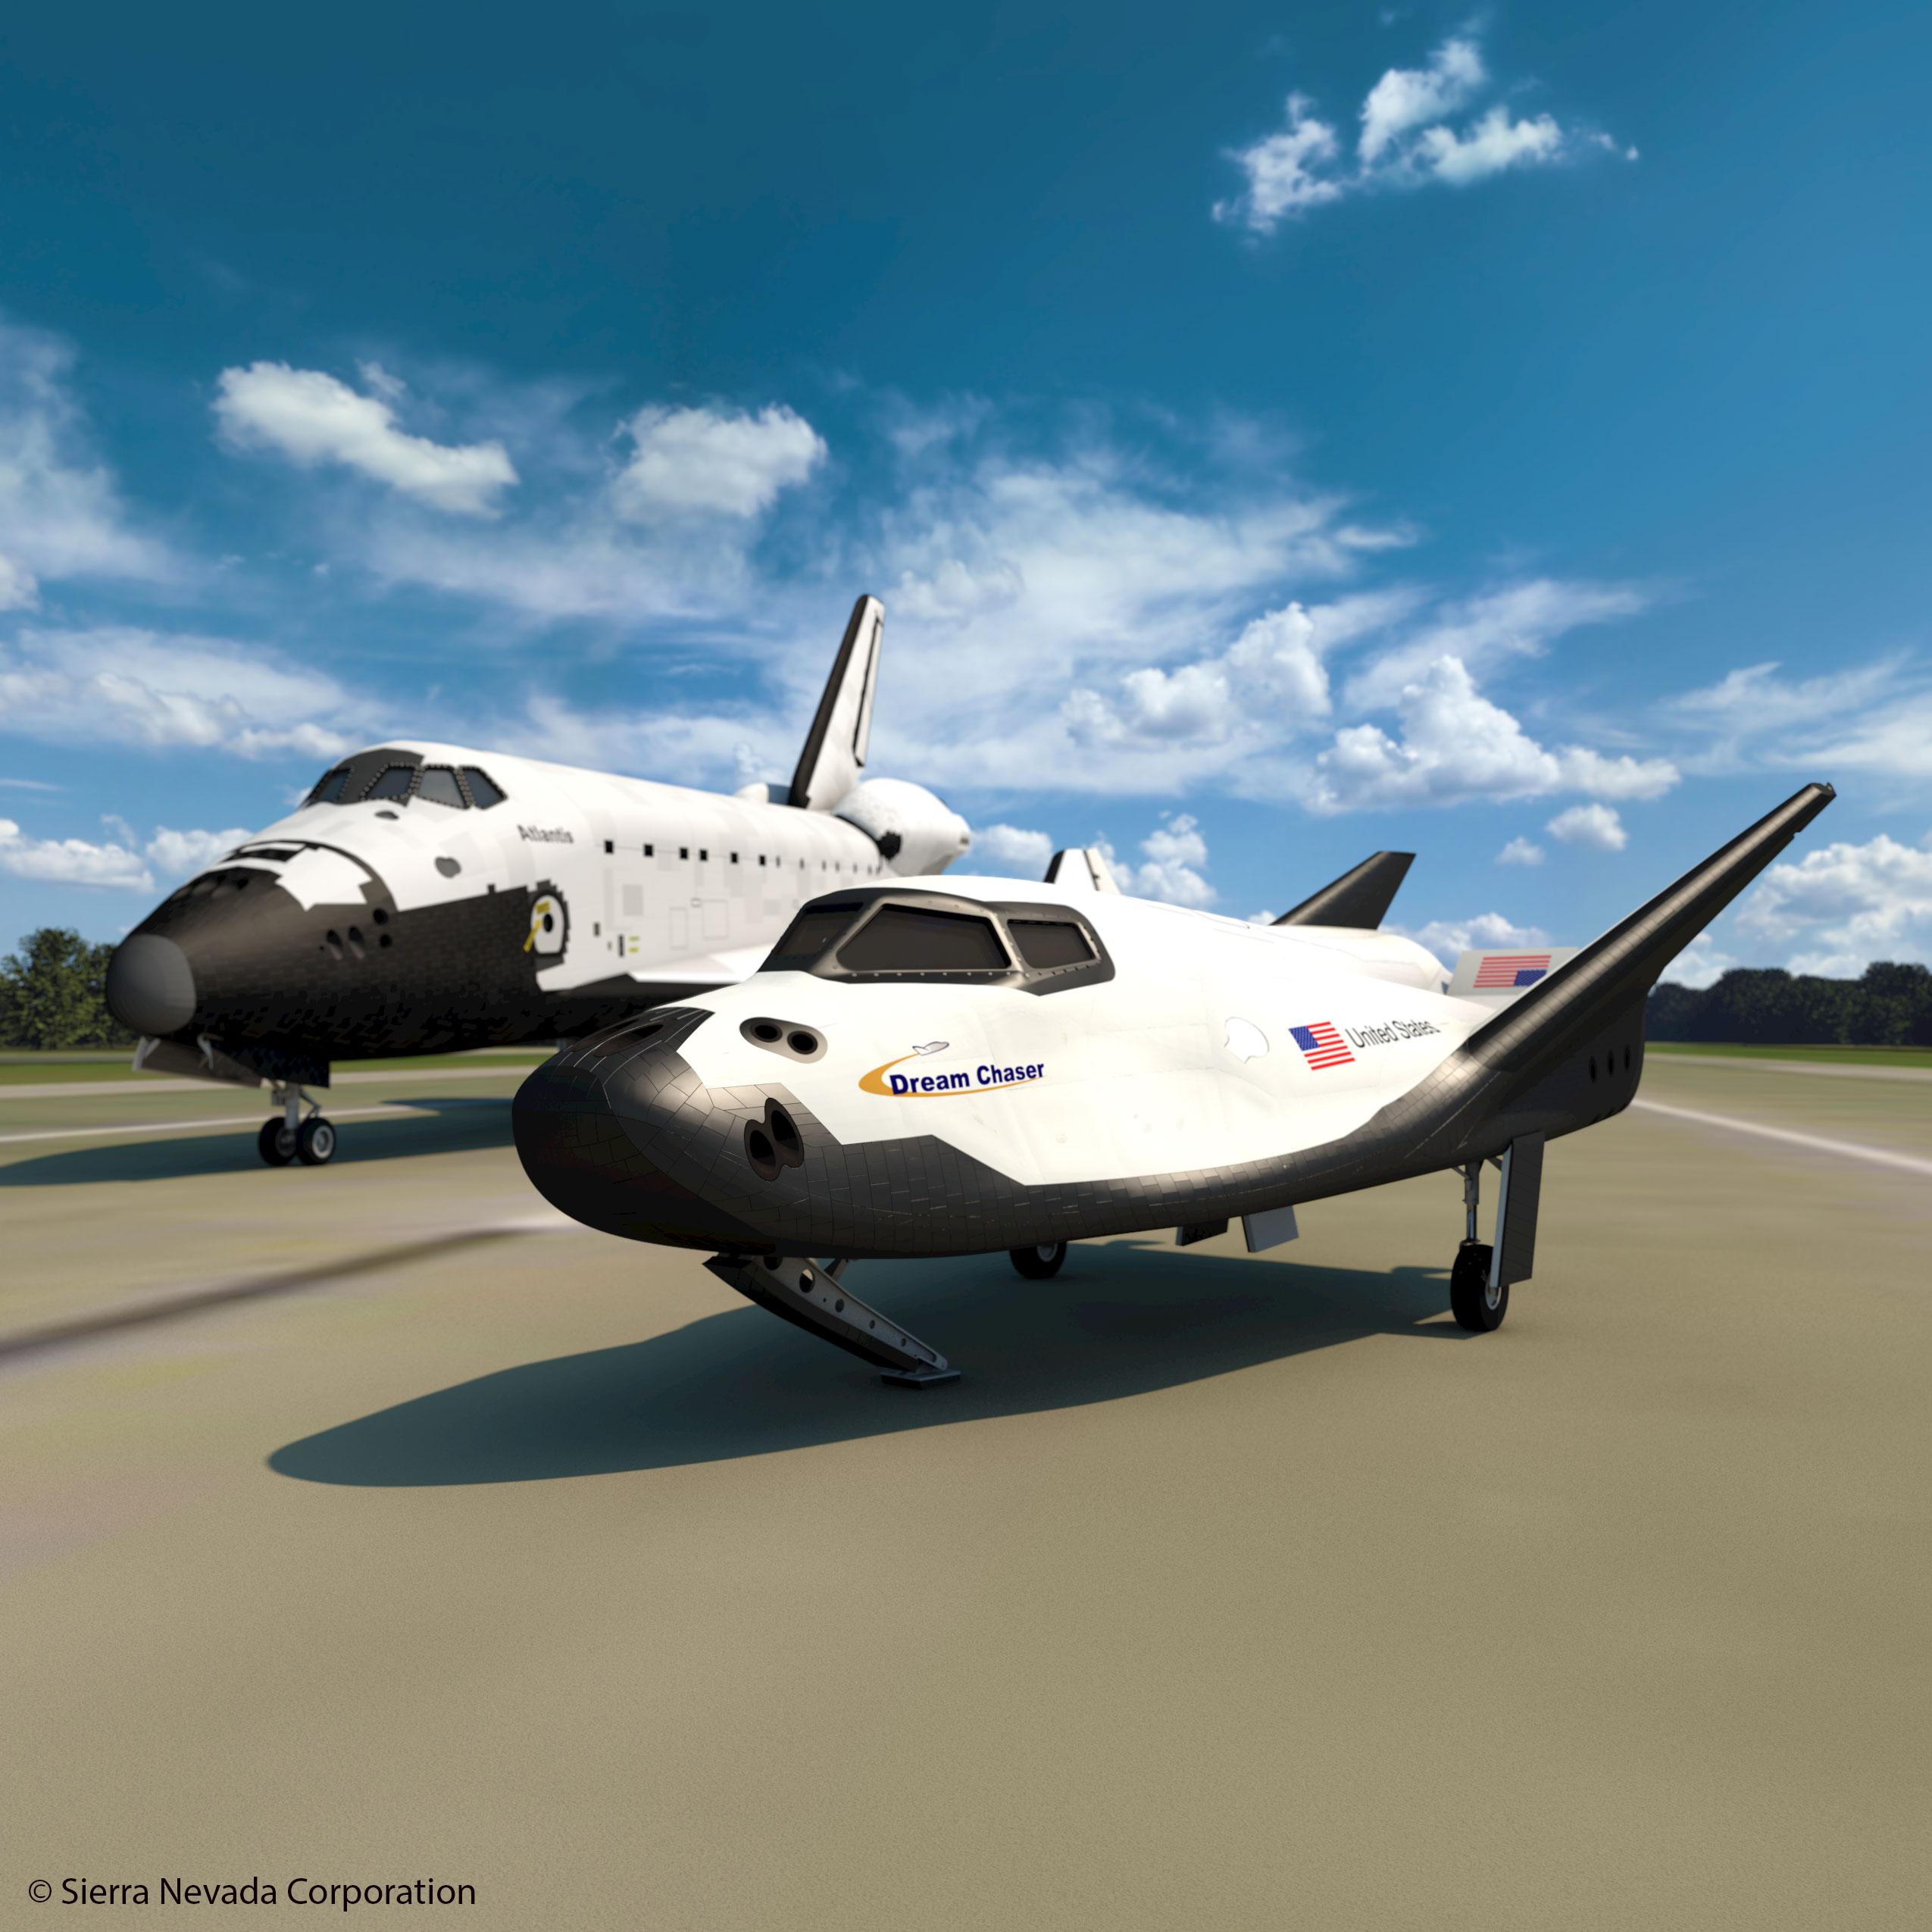 nasa mini space shuttle - photo #9